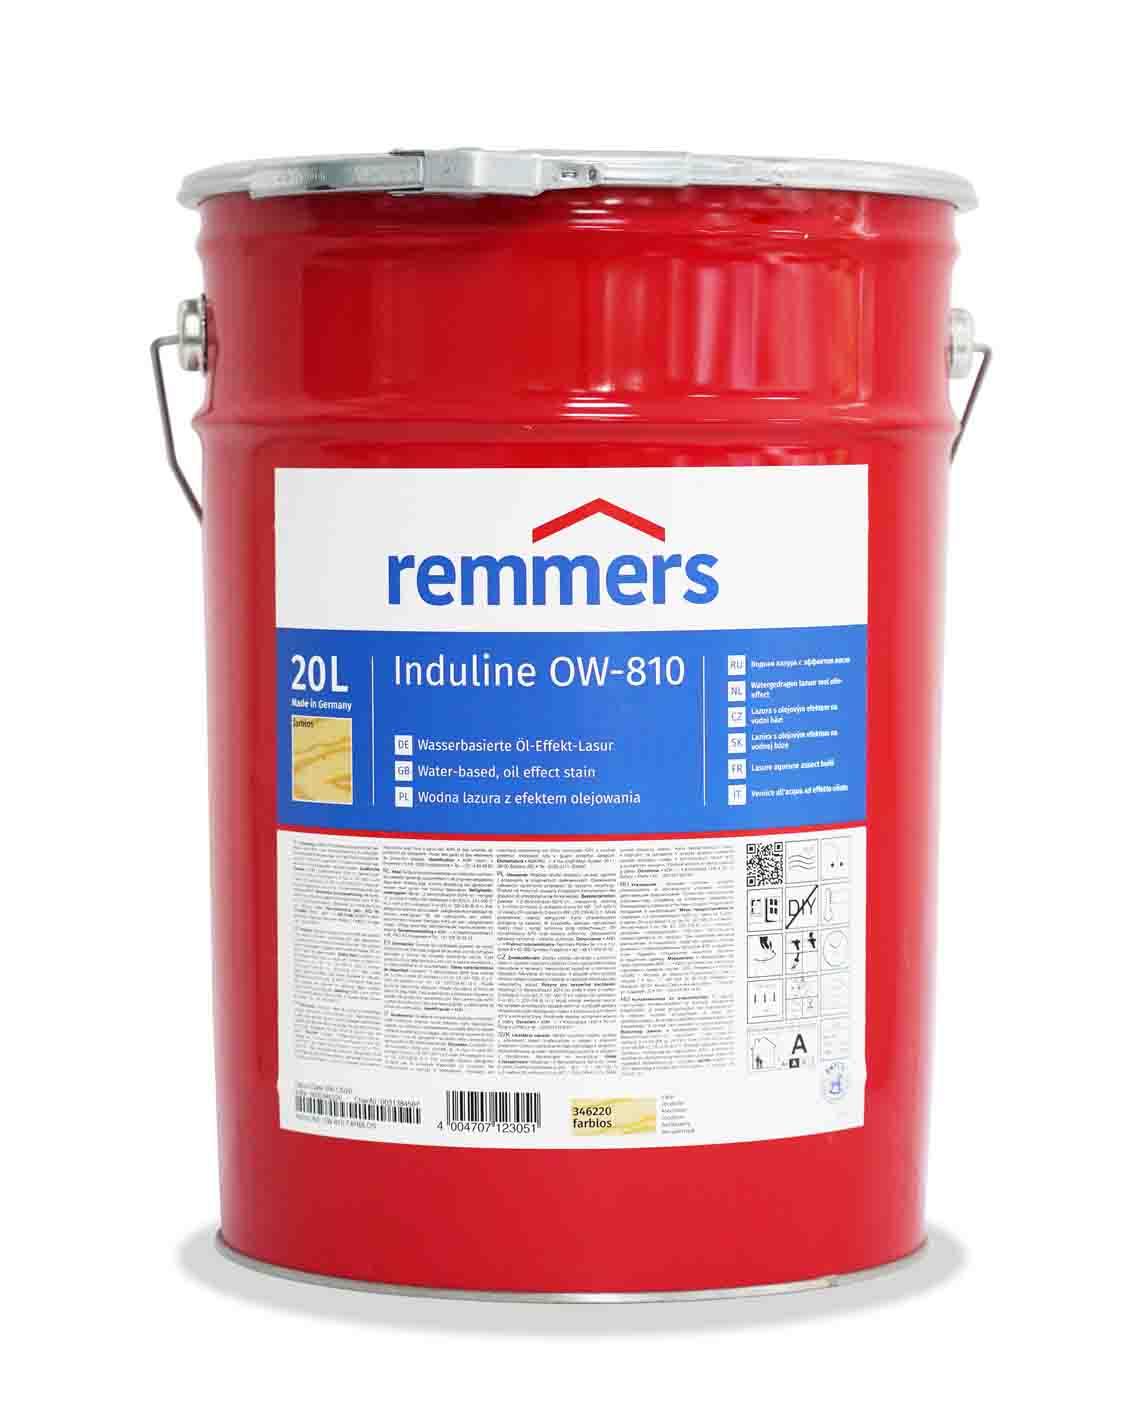 remmers-Induline OW-810 姘存�ч�㈡�